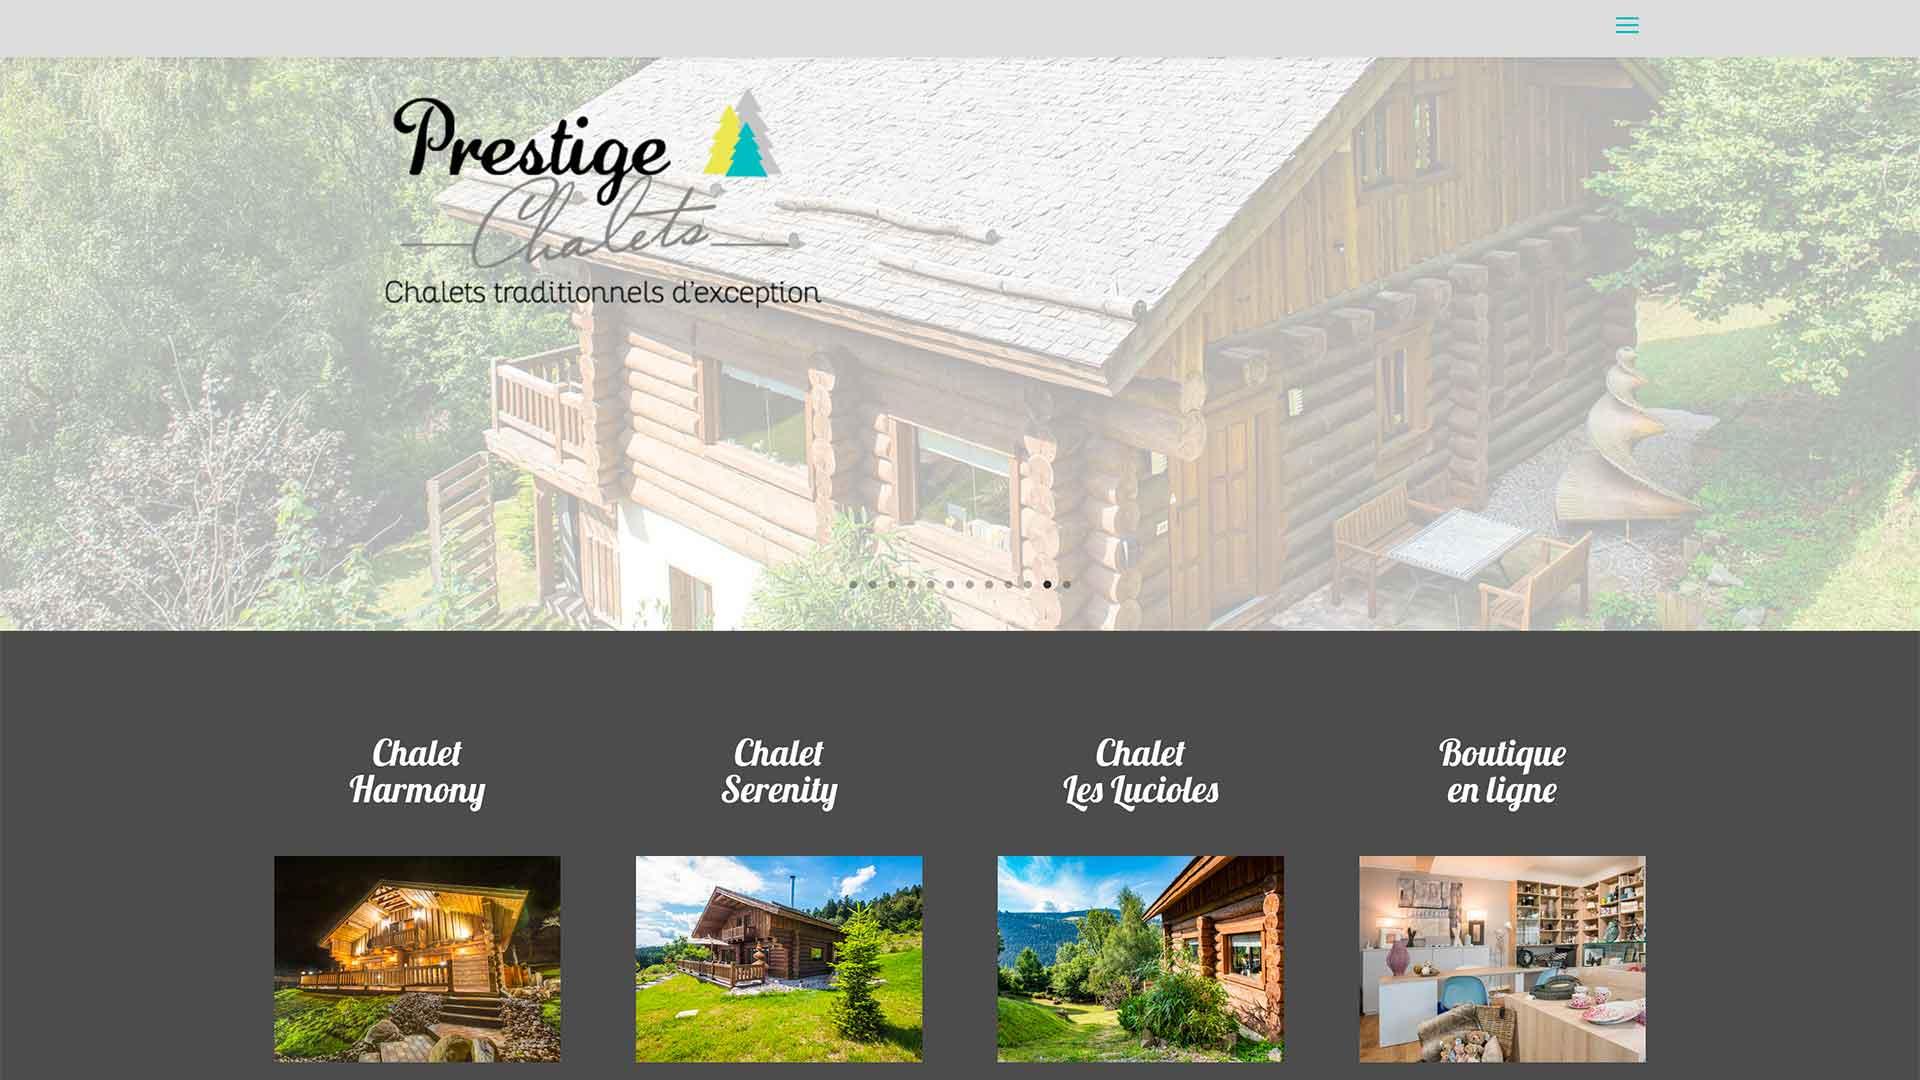 Prestige Chalets